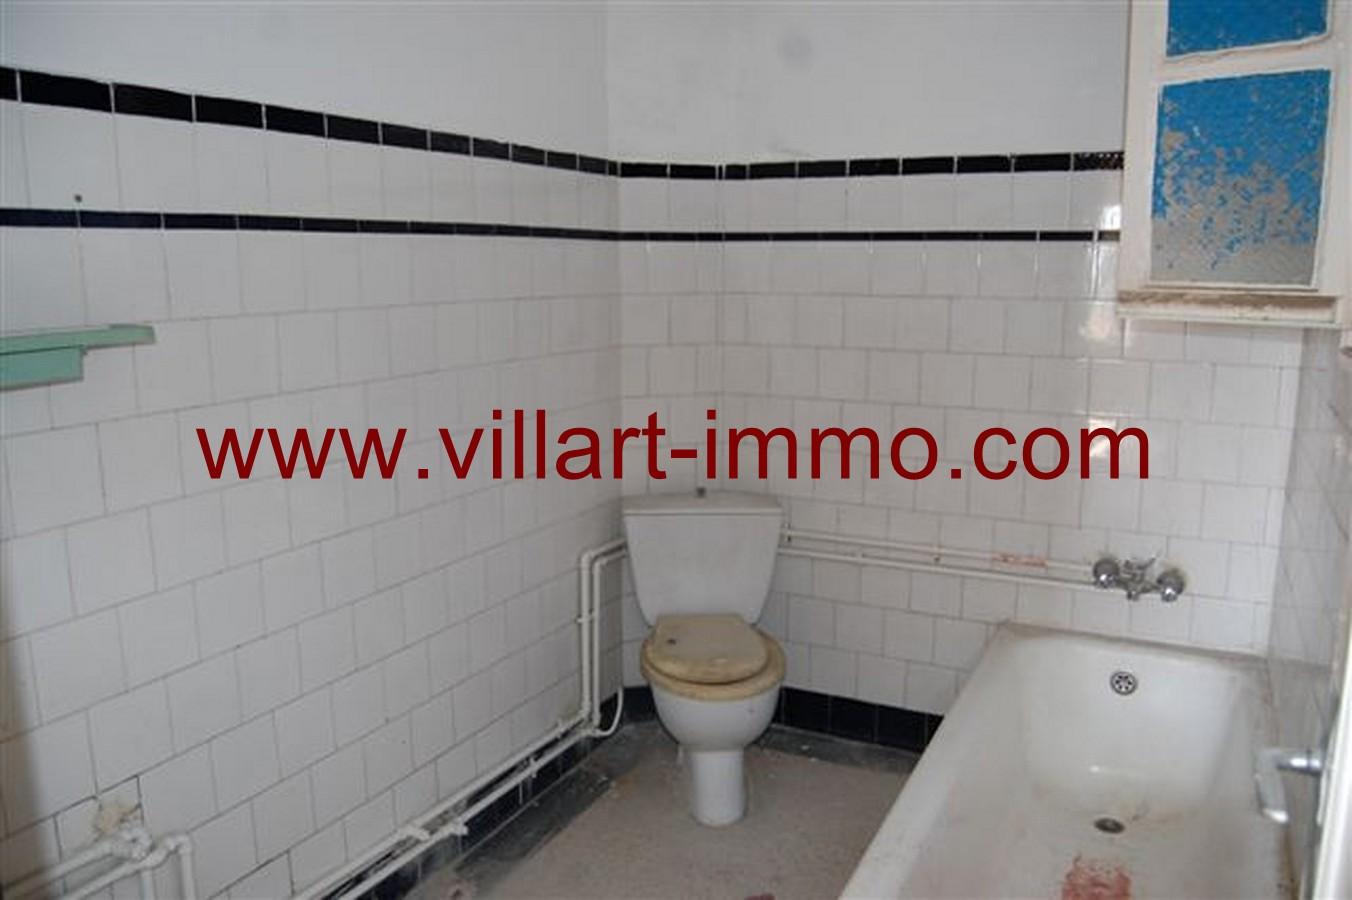 8-Vente-Appartement-Tanger-Salle de bain -VA532-Jirari-Villart Immo